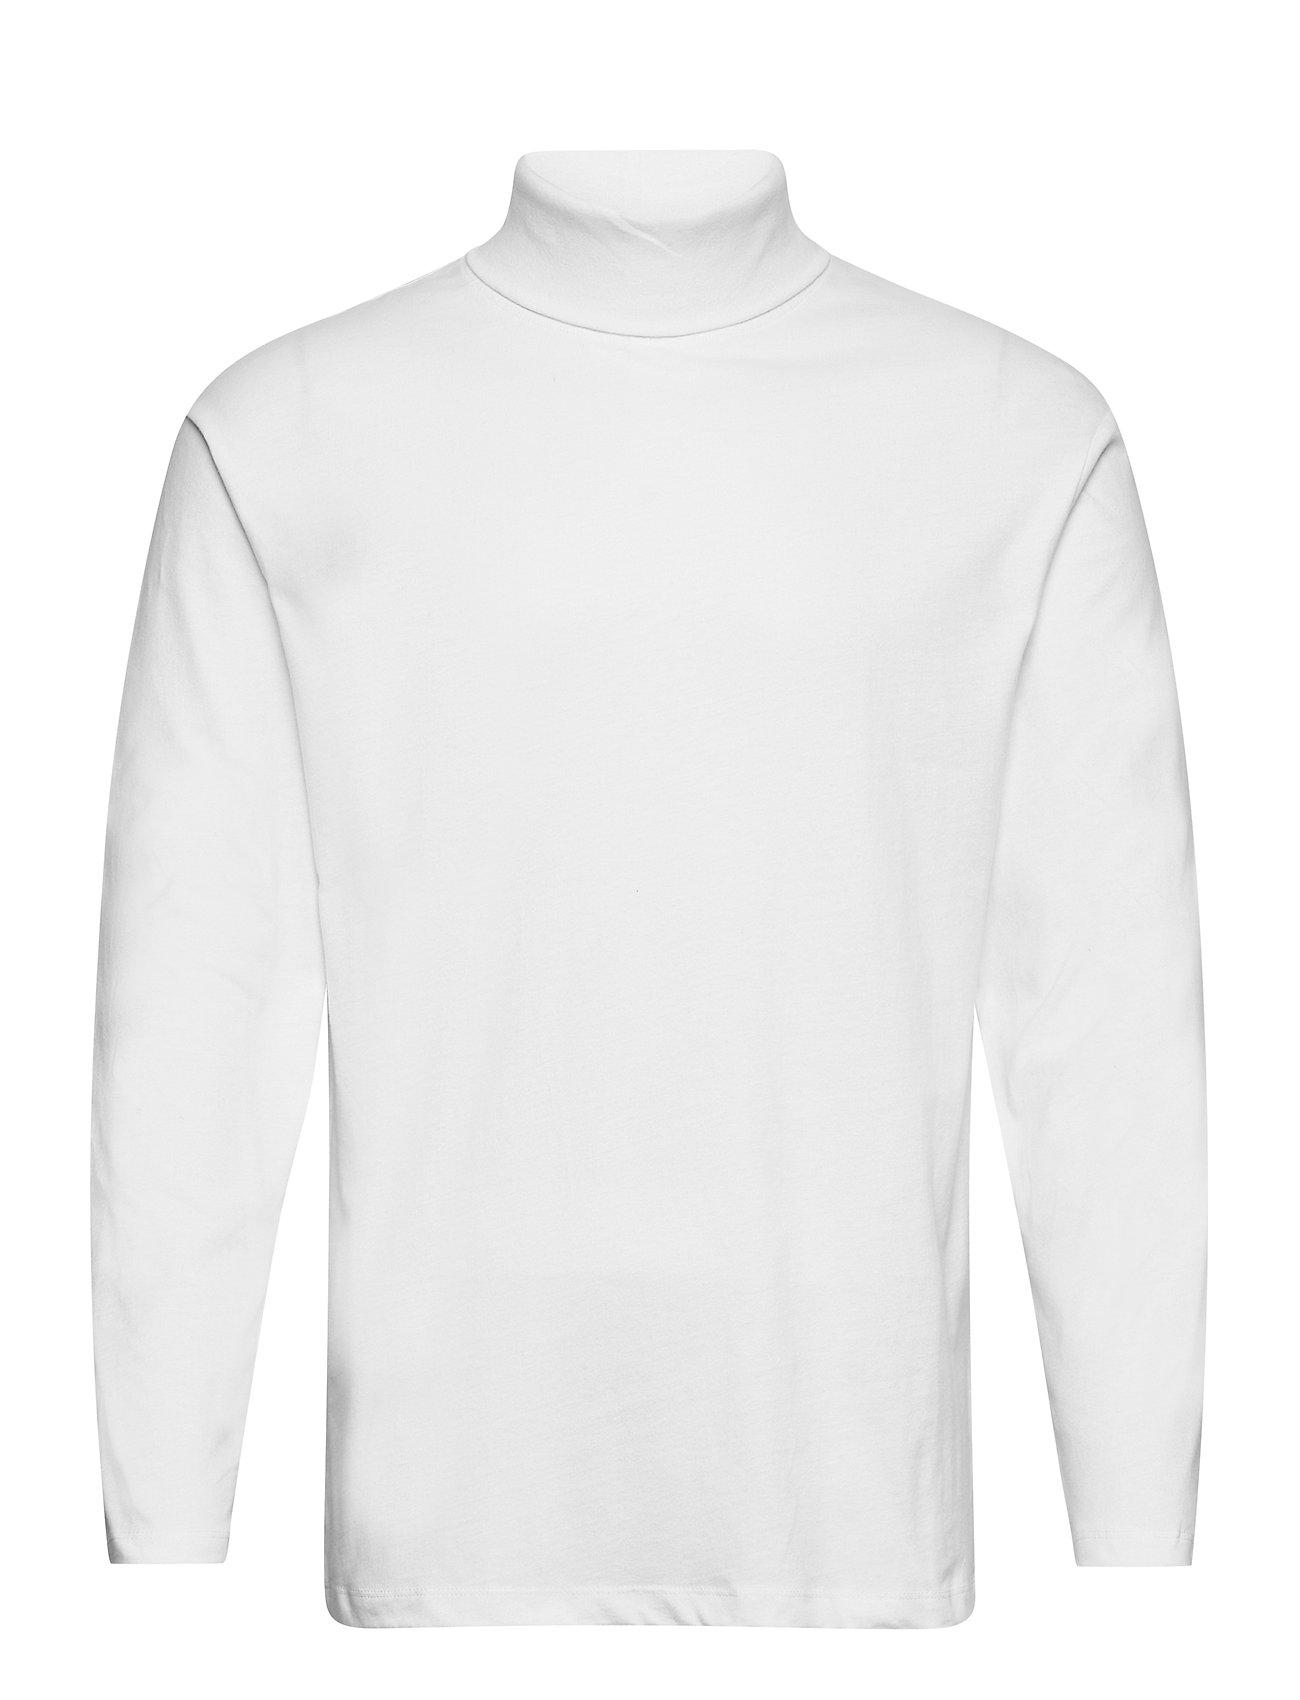 Jjeriley Tee Ls Roll Neck Sn T-Langærmet Skjorte Hvid Jack & J S